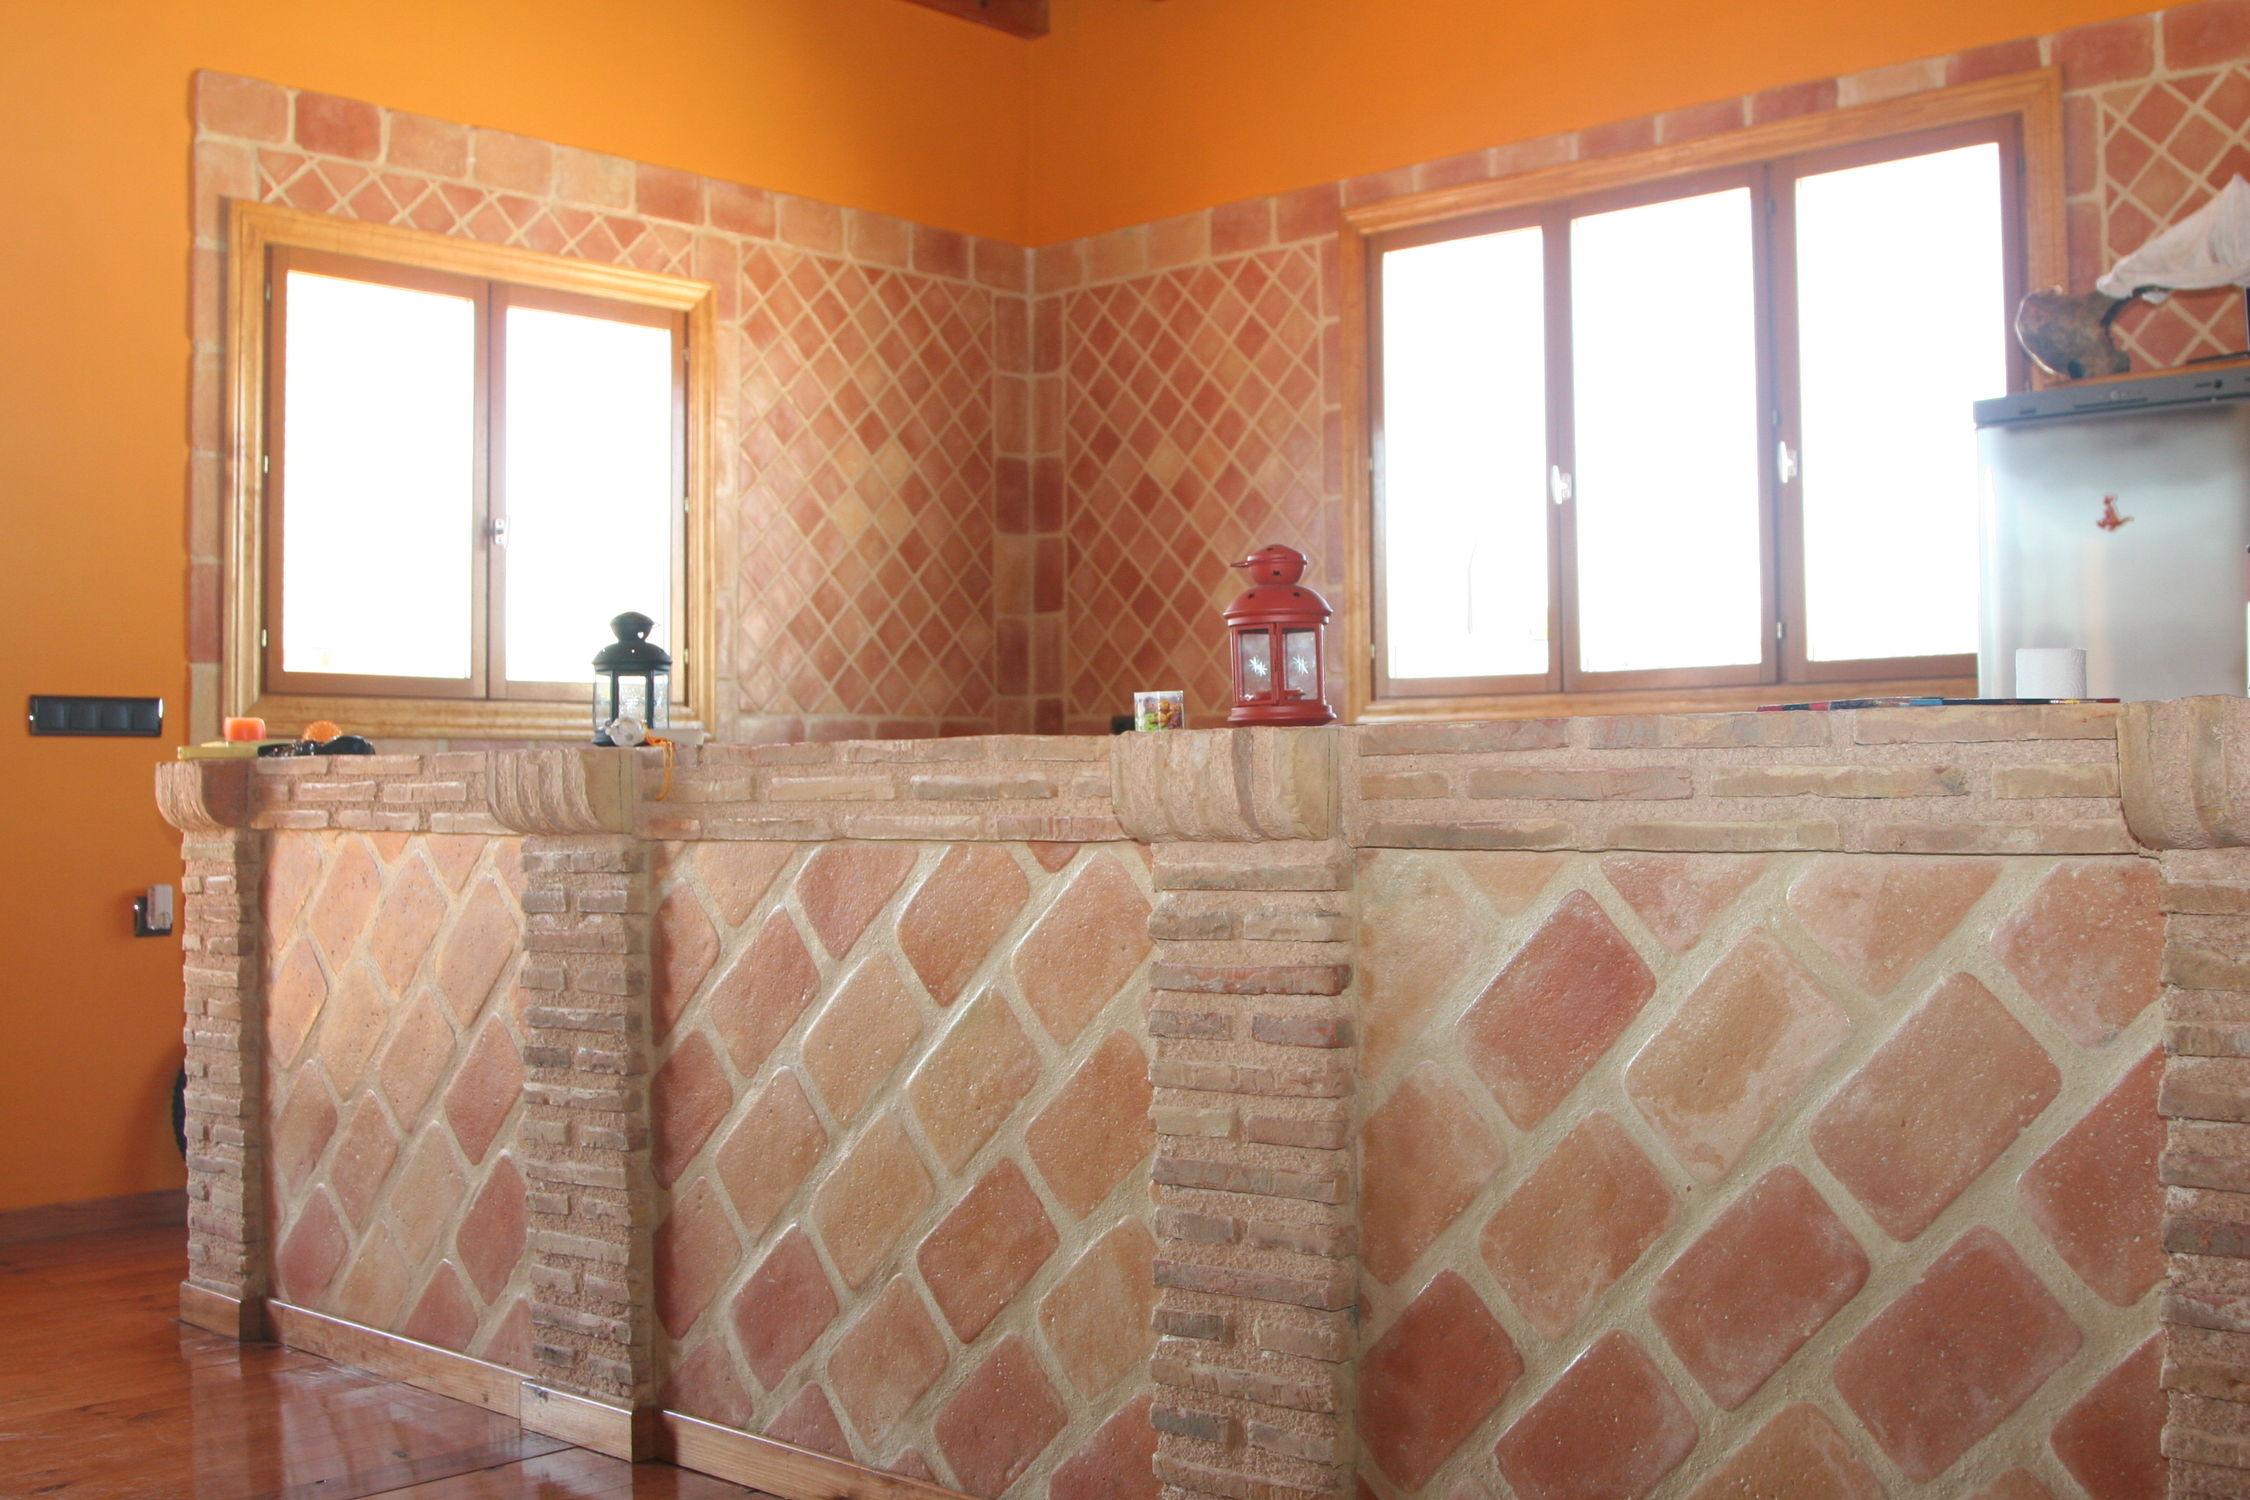 Piastrella da interno da parete in terracotta opaca